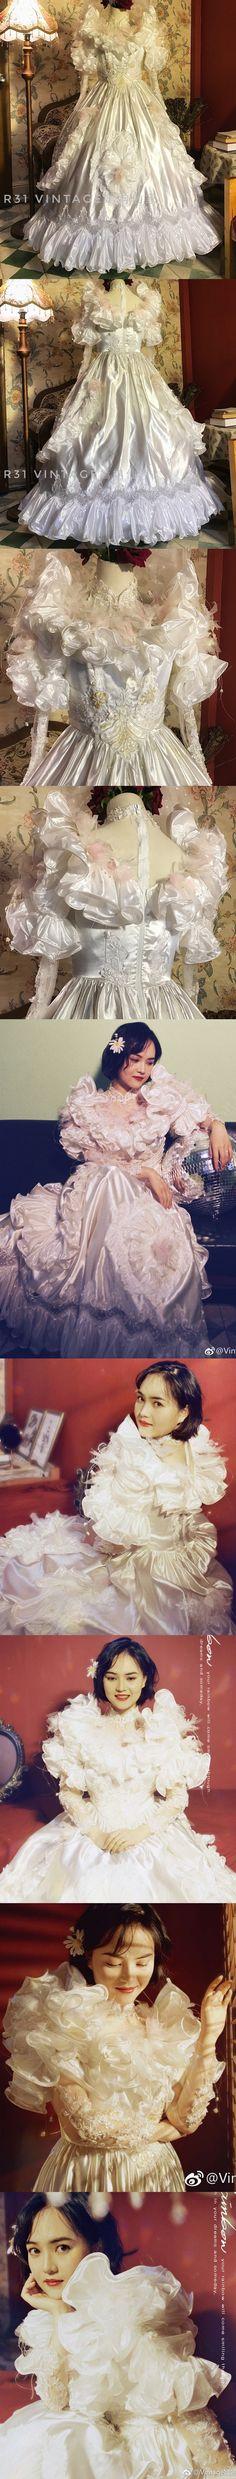 Nice Dresses, Amazing Dresses, Casual Attire, Gorgeous Wedding Dress, Wedding Gowns, Fairy Tales, Bride, Cute, Doll